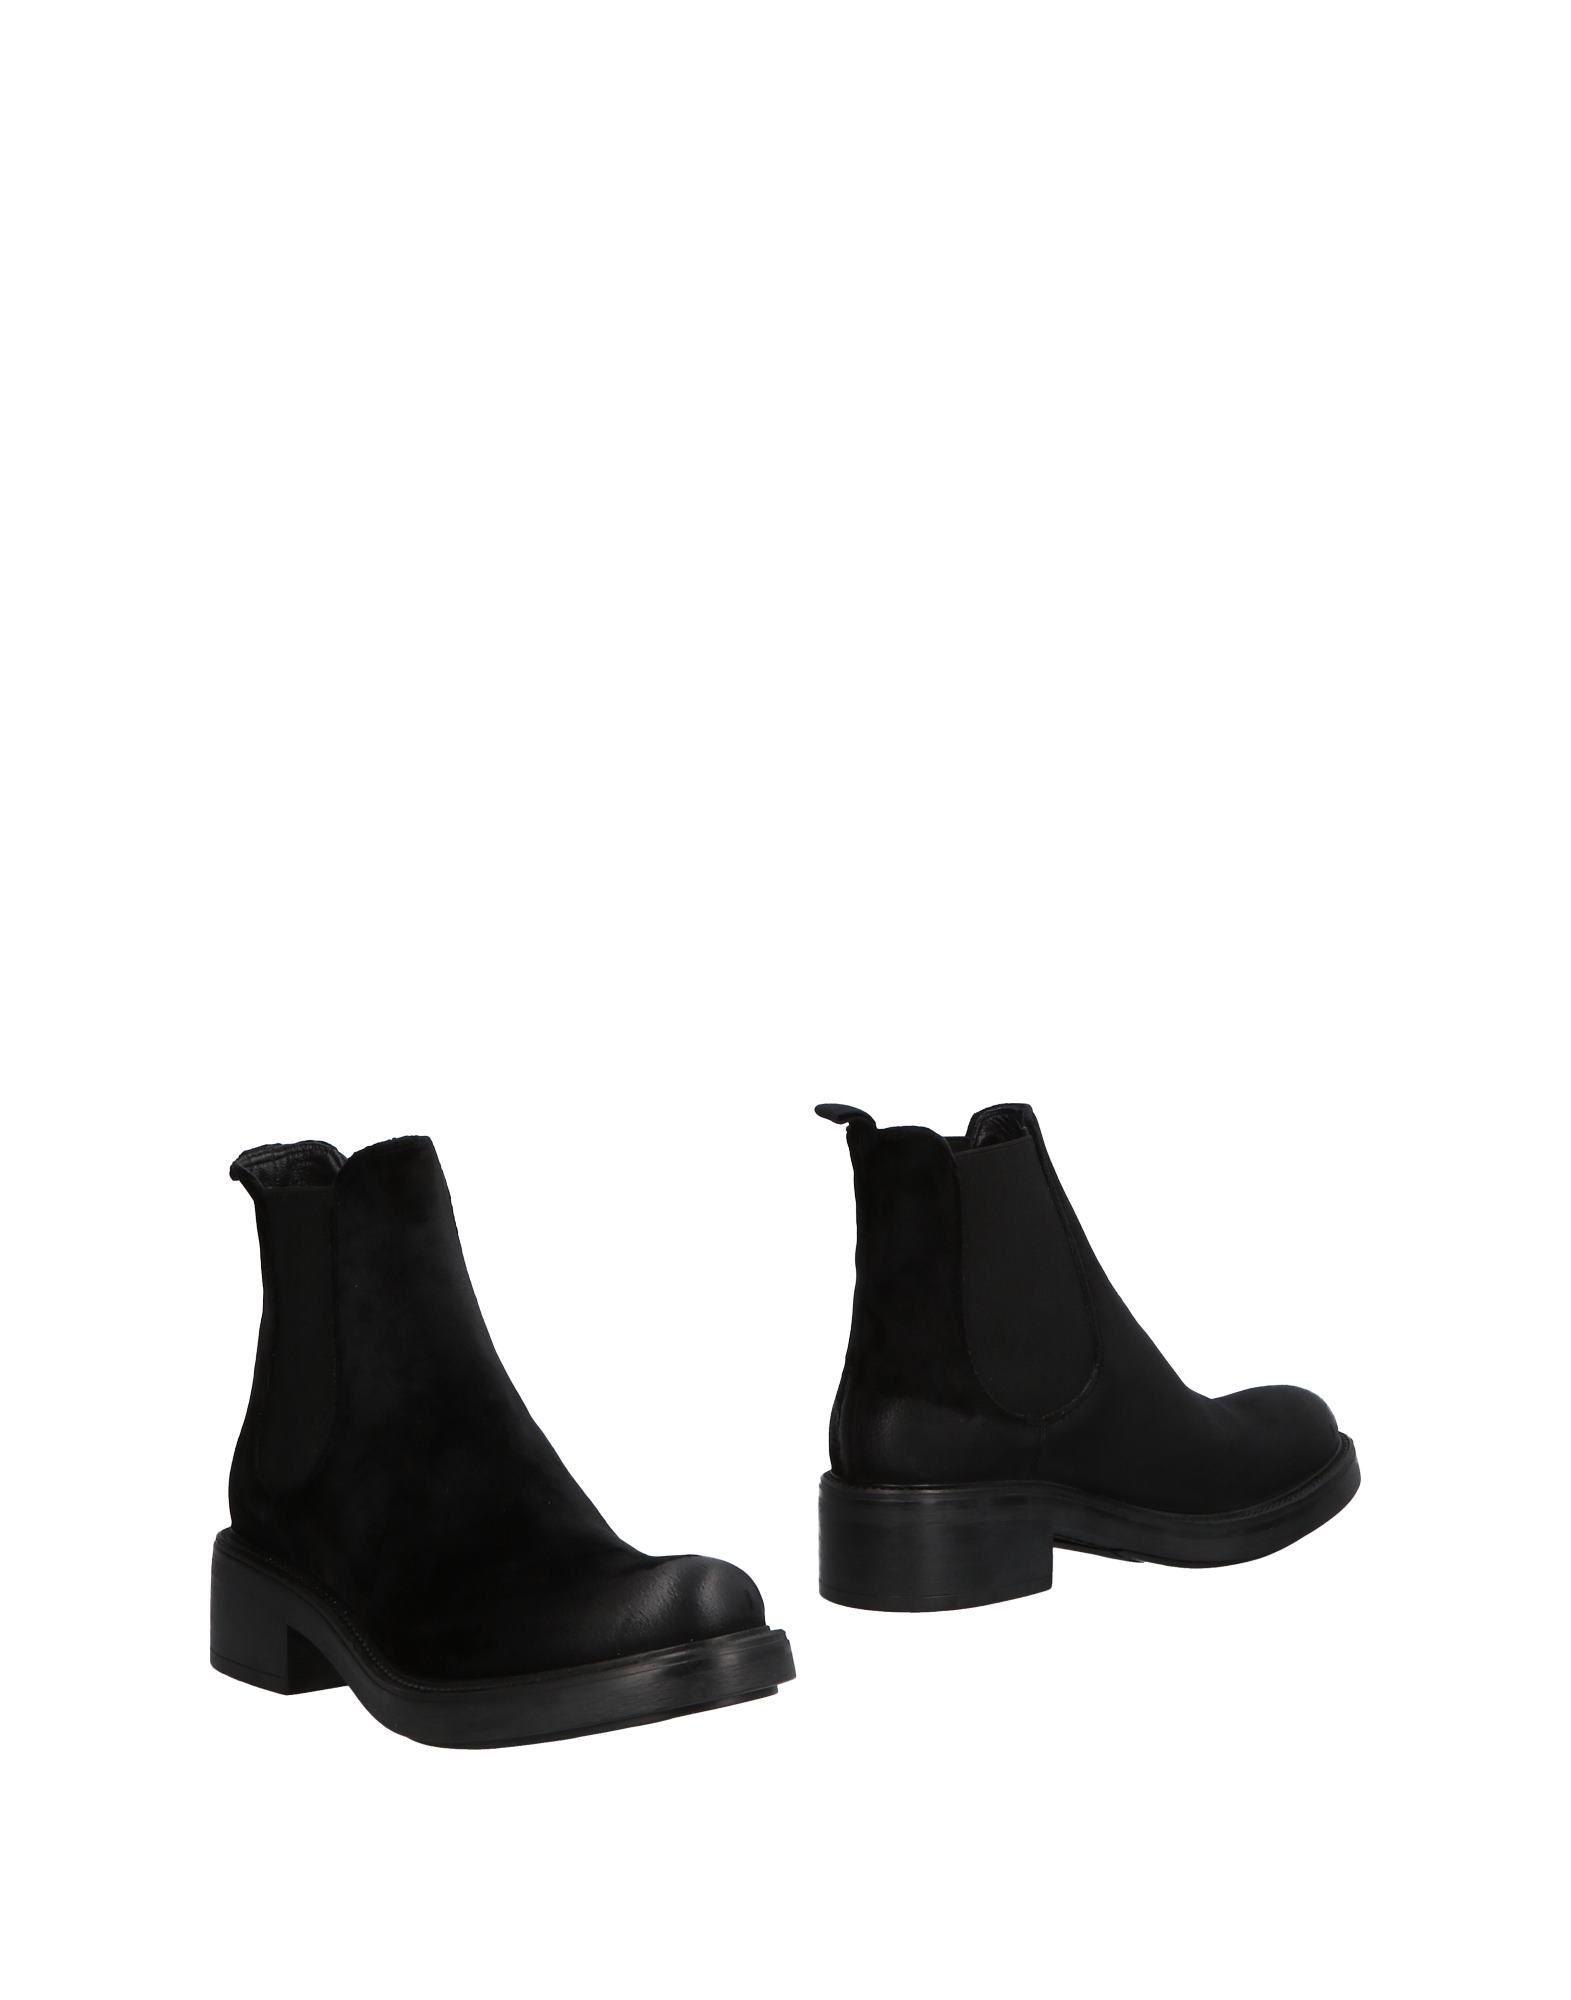 Strategia Ankle Boot - Women Strategia  Ankle Boots online on  Strategia United Kingdom - 11502574EQ 5622ae